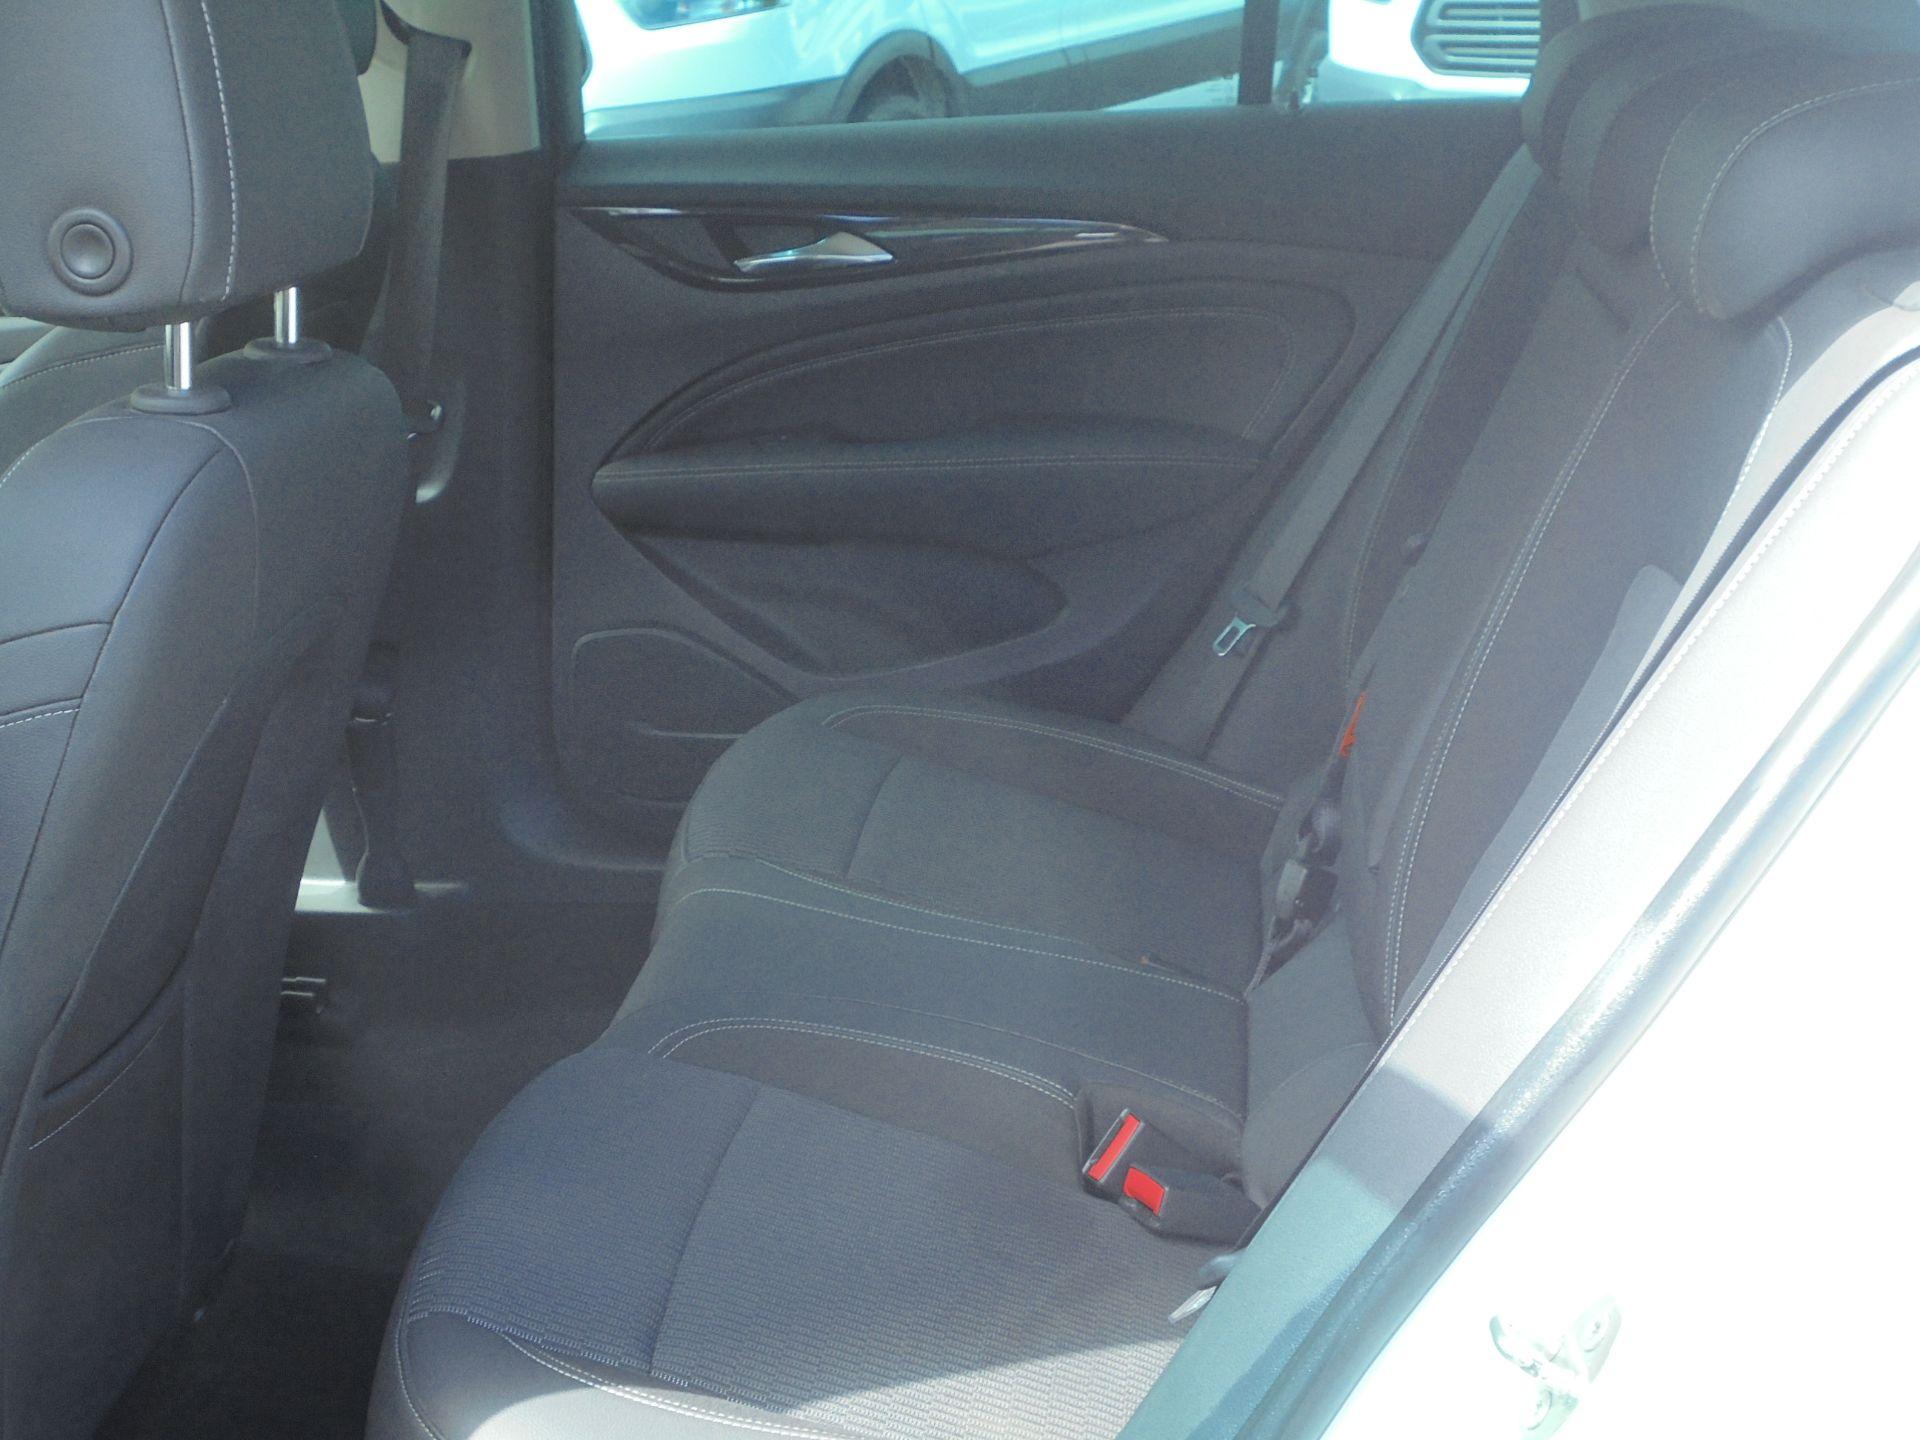 2018 Vauxhall Insignia Grand Sport 1.6 Turbo D Ecotec [136] Sri Nav 5Dr (VU18DFF) Image 6